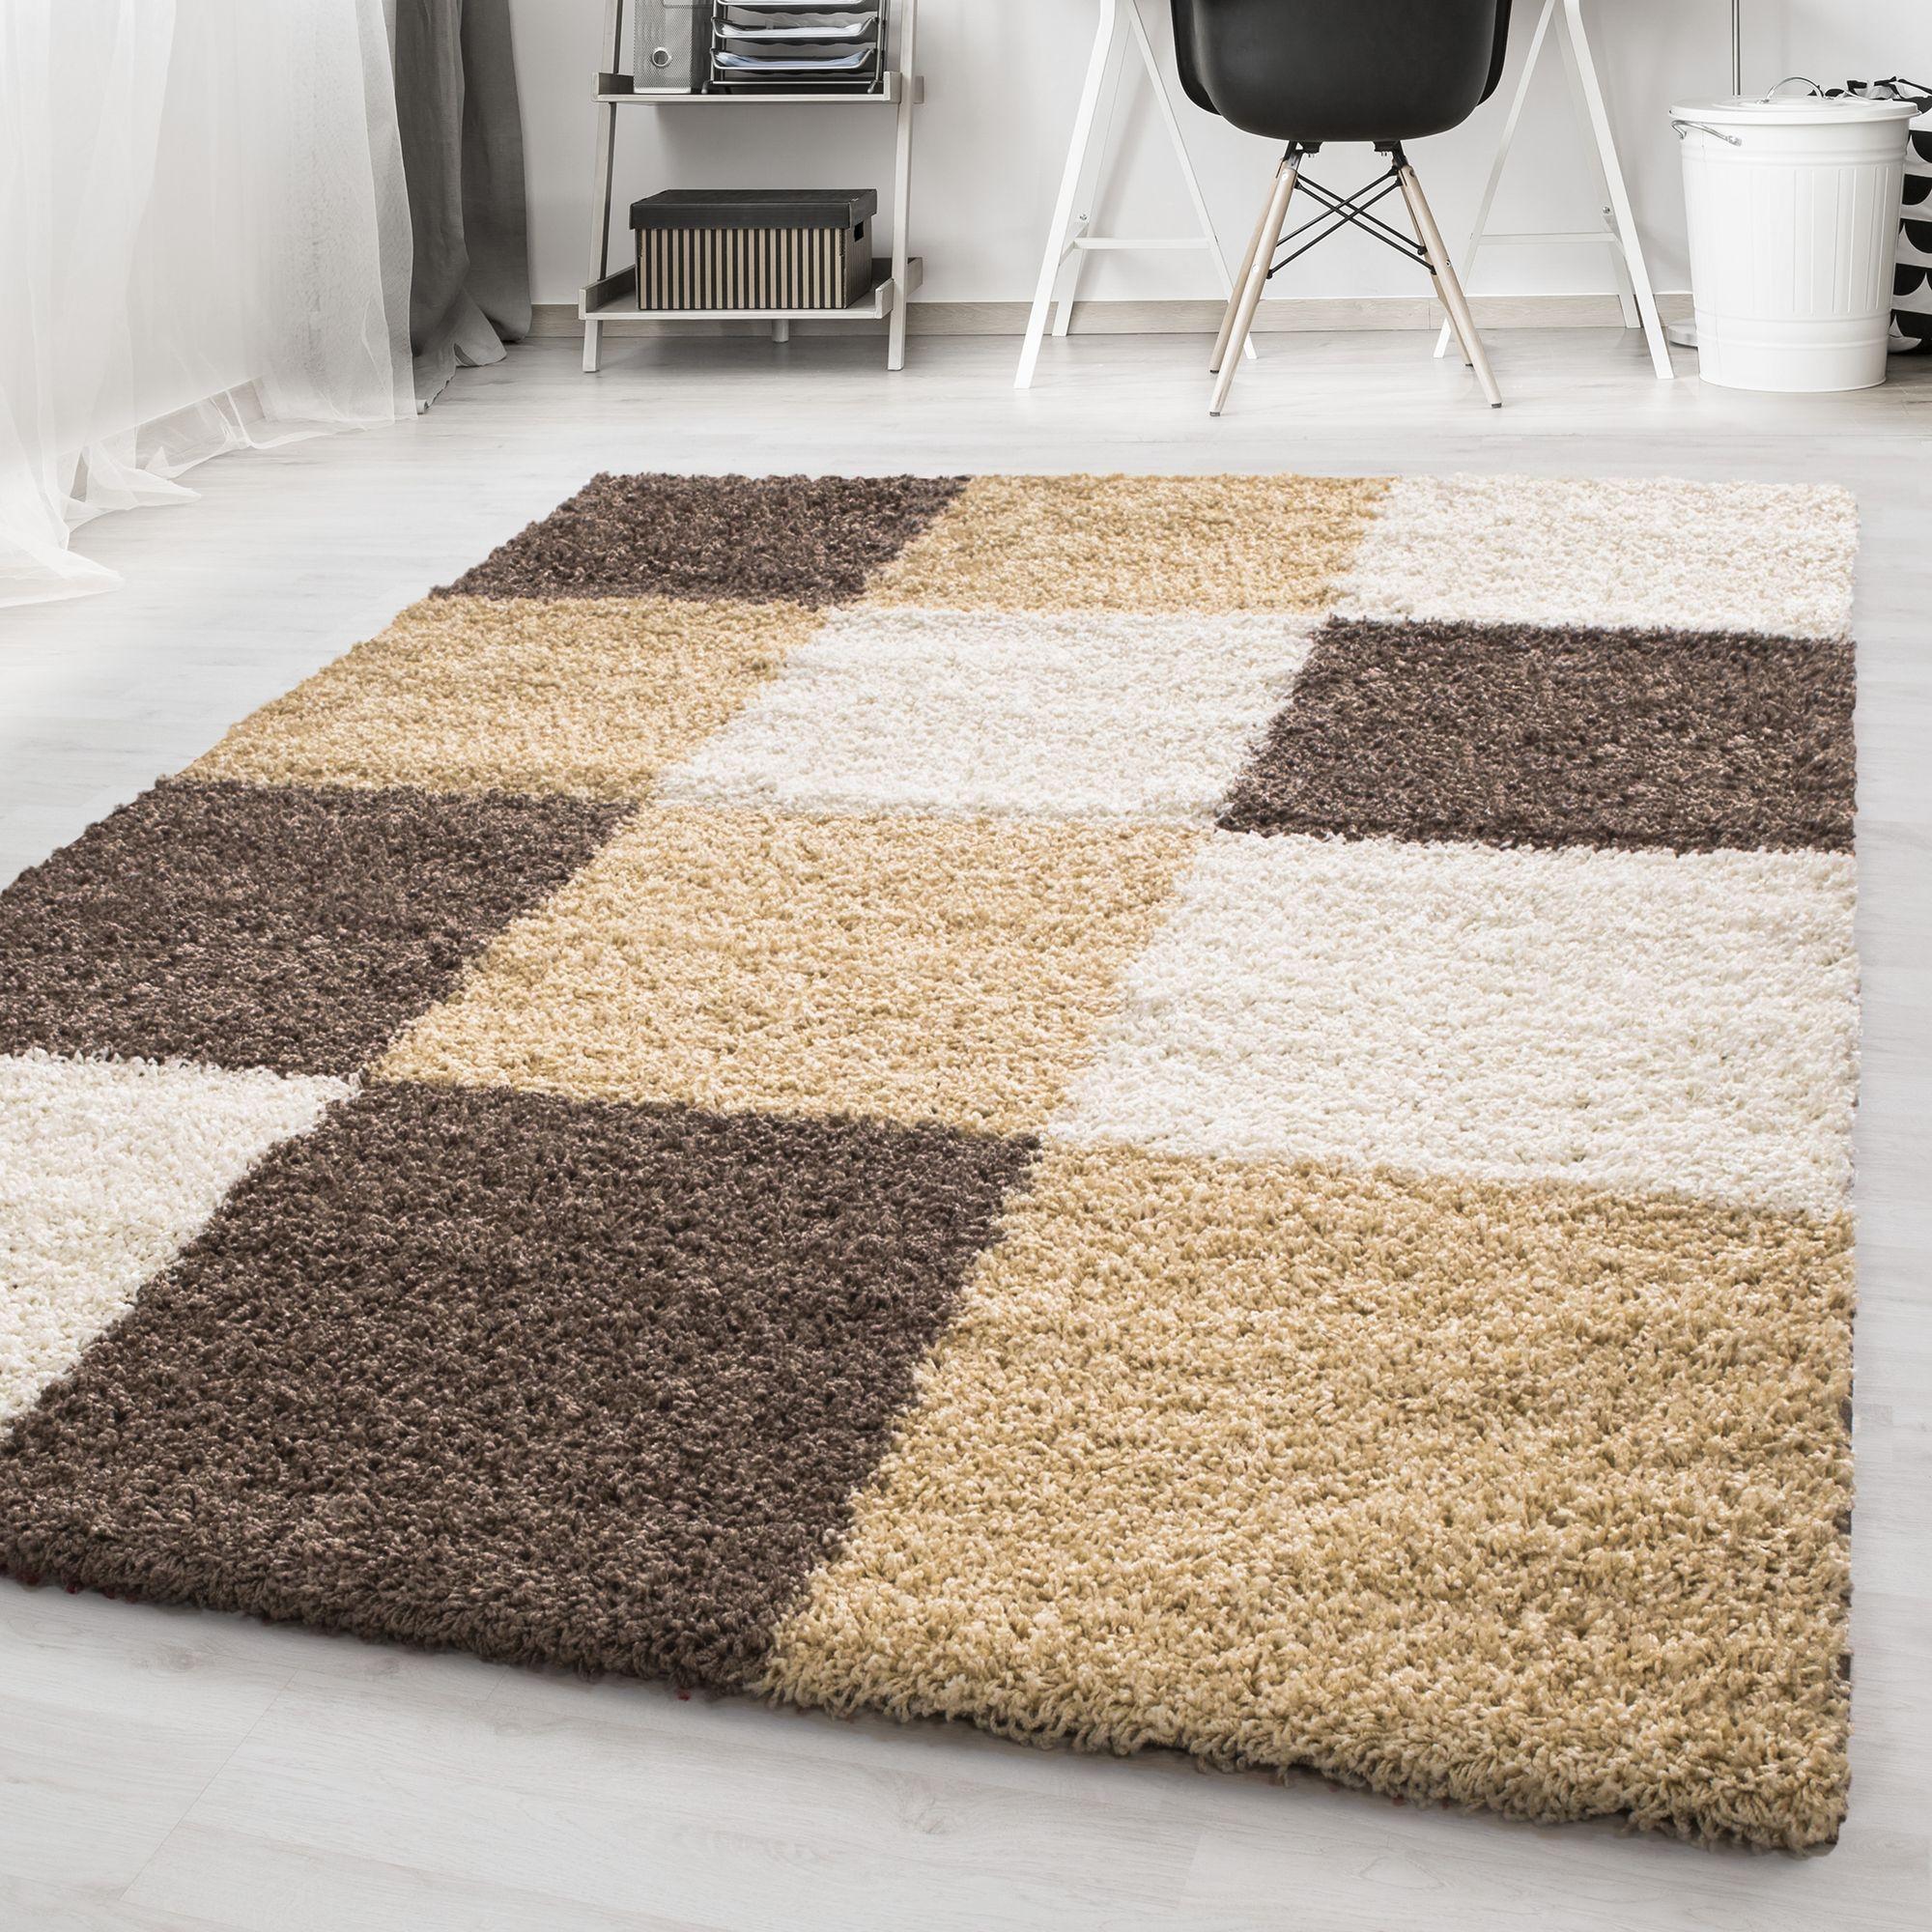 Designer Shaggy Area Rugs Long Pile